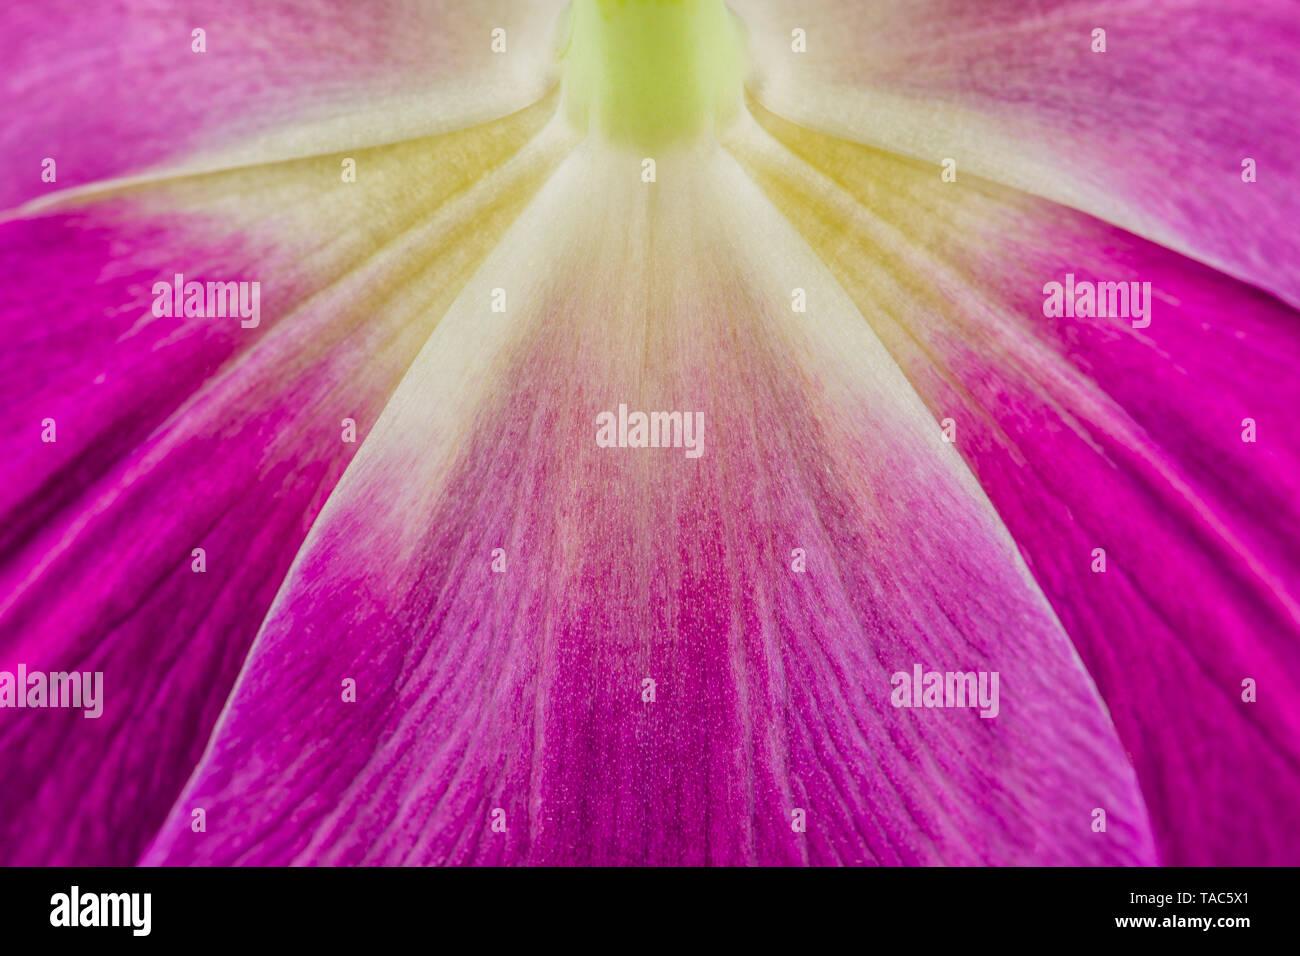 Tulip, close-up - Stock Image